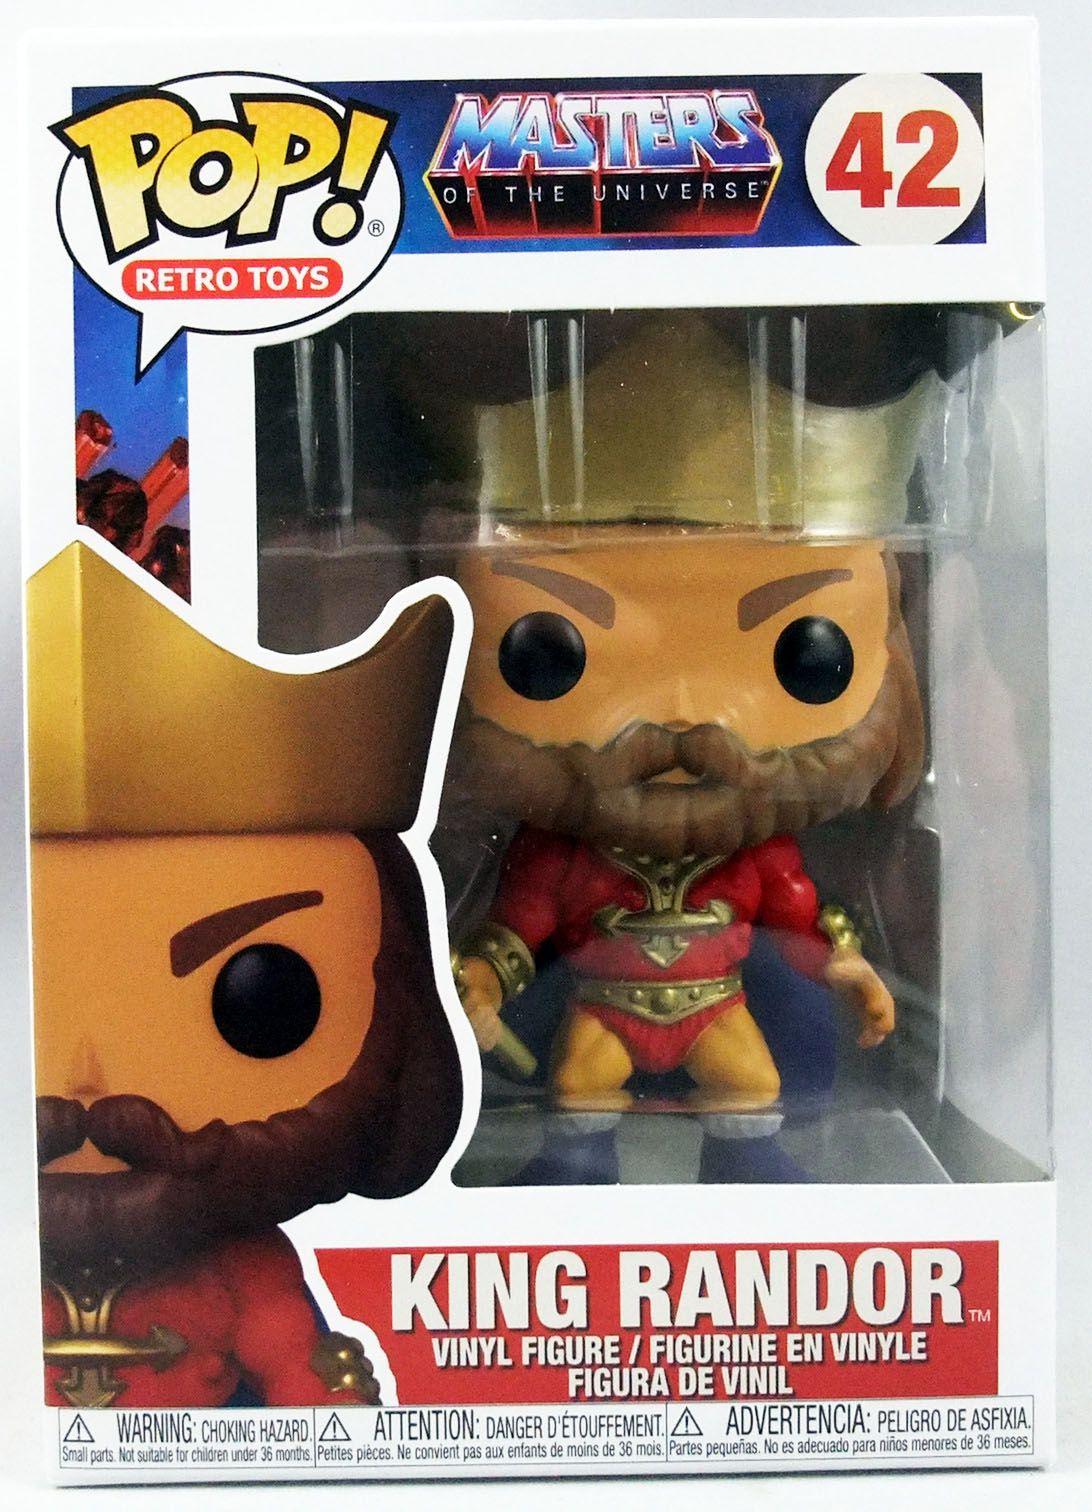 Masters of the Universe - Funko POP! vinyl figure - King Randor #42